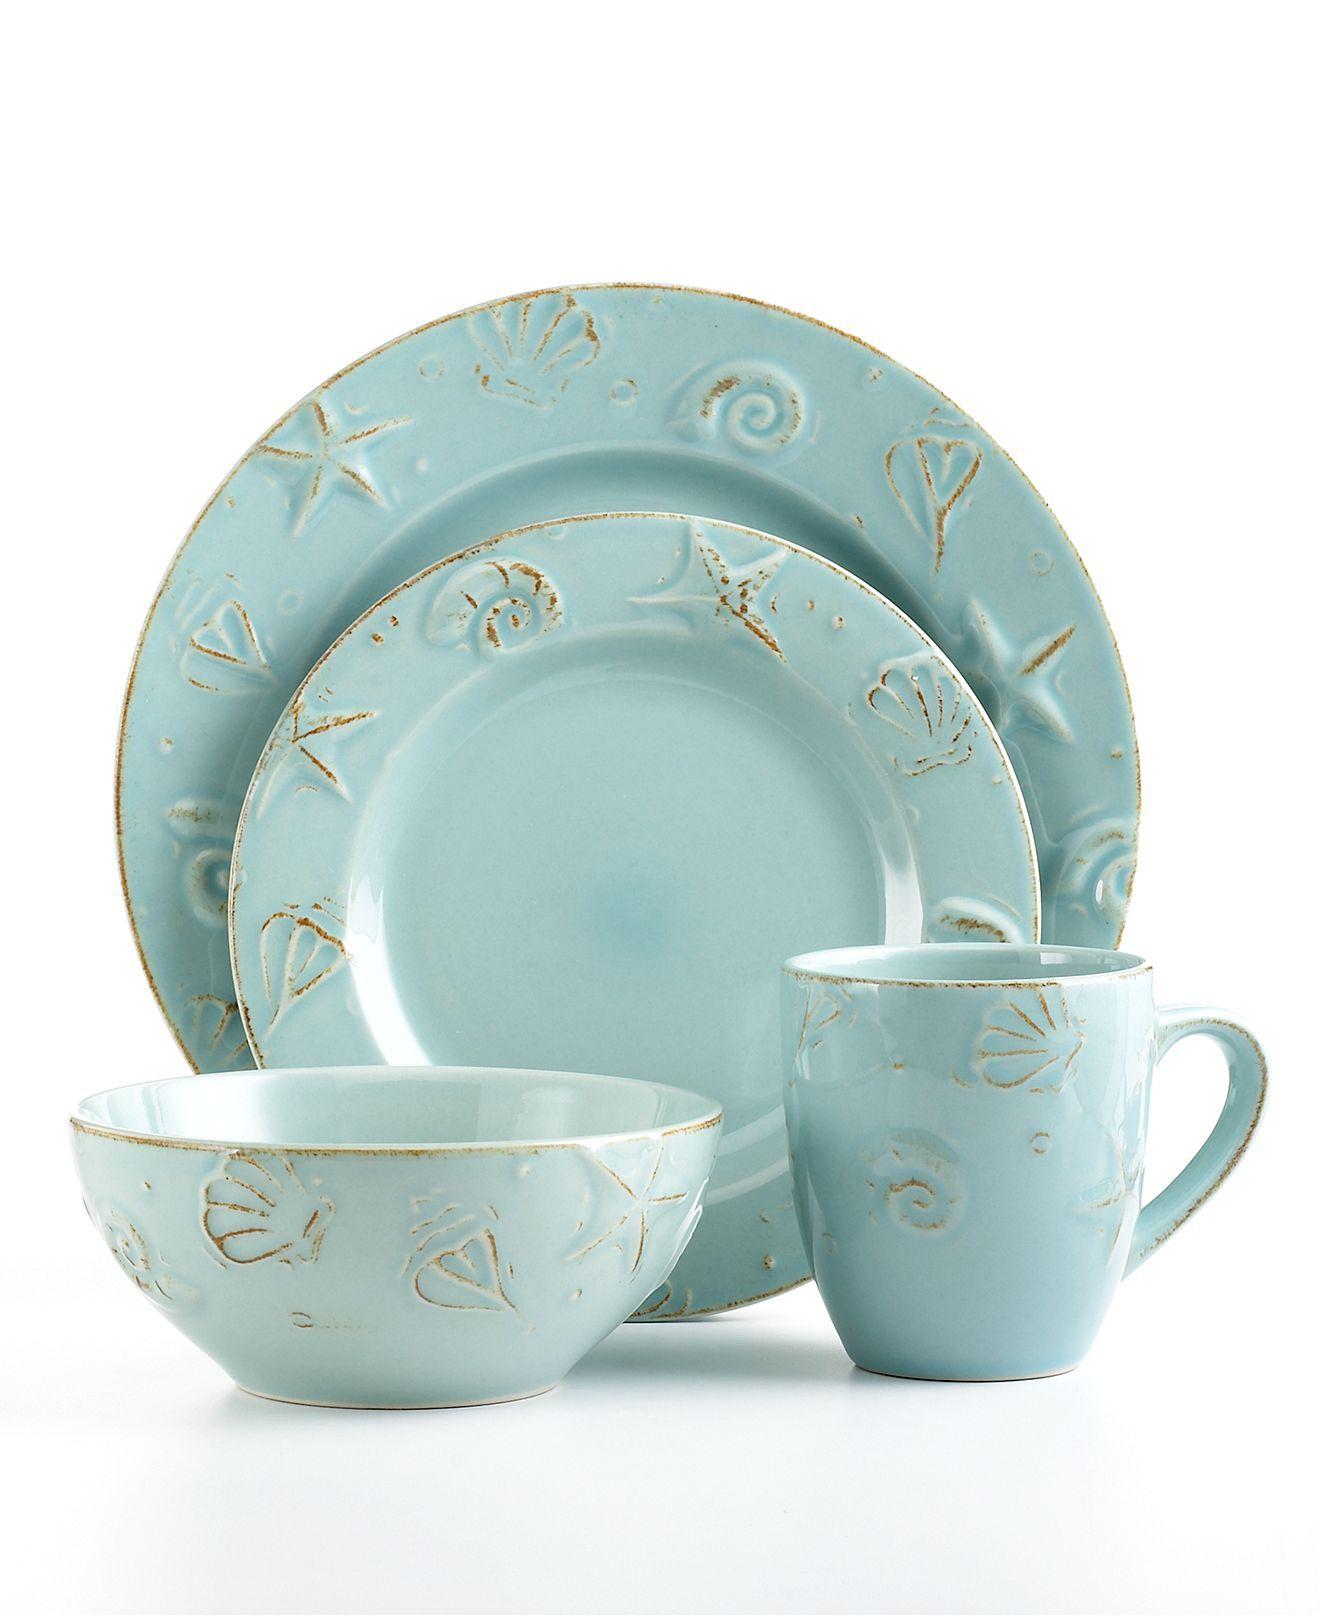 Thomson Pottery Dinnerware Cape Cod 16 Piece Set Casual